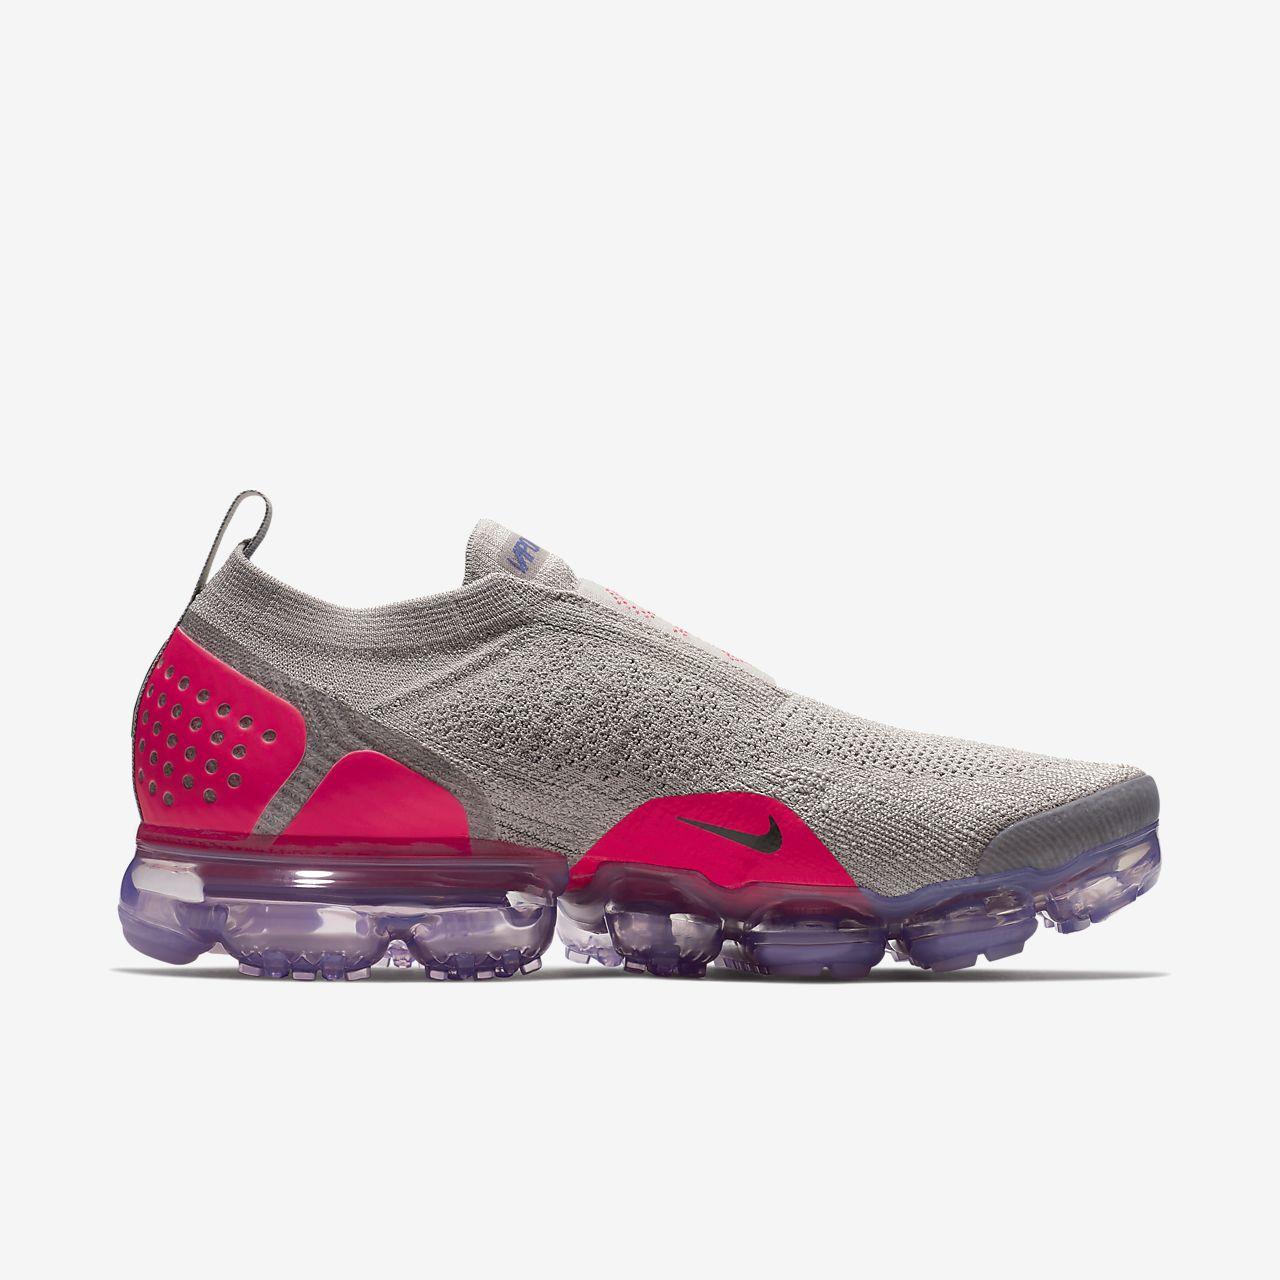 new styles dd4d6 44b0d ... Chaussure Nike Air VaporMax Flyknit Moc 2